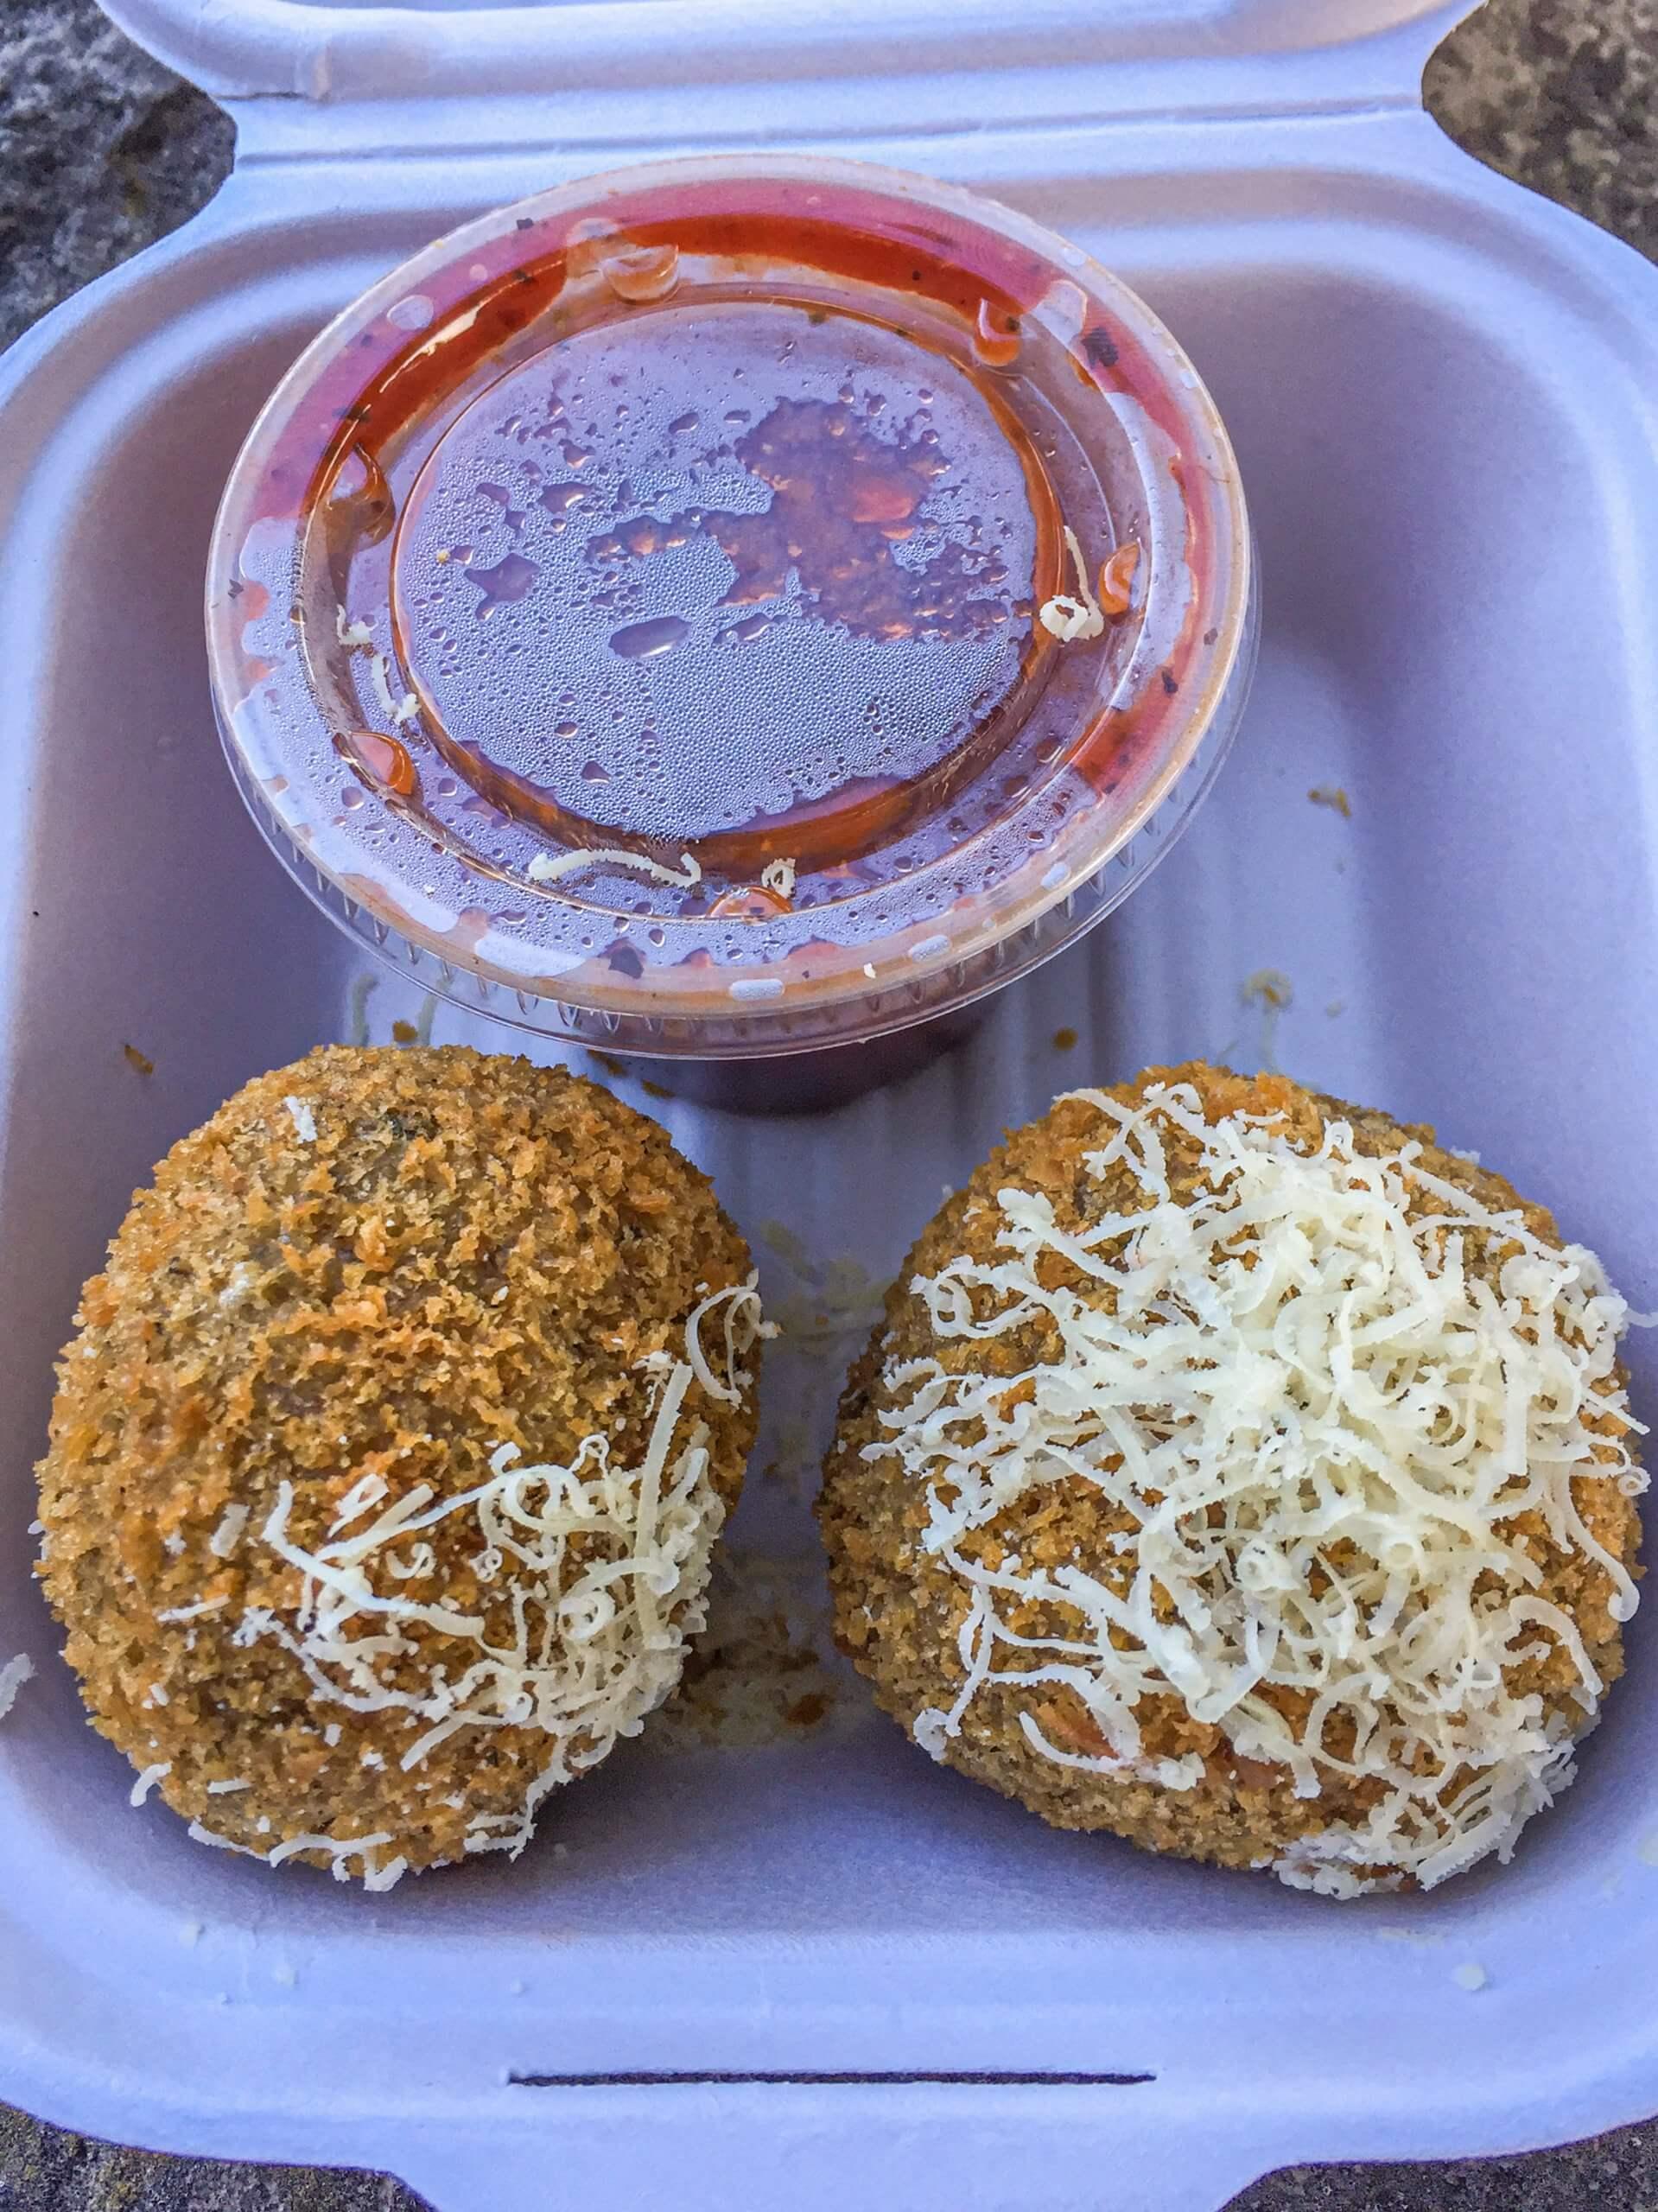 Summer 2020 Kitchener's Shmuck Food Truck Balls